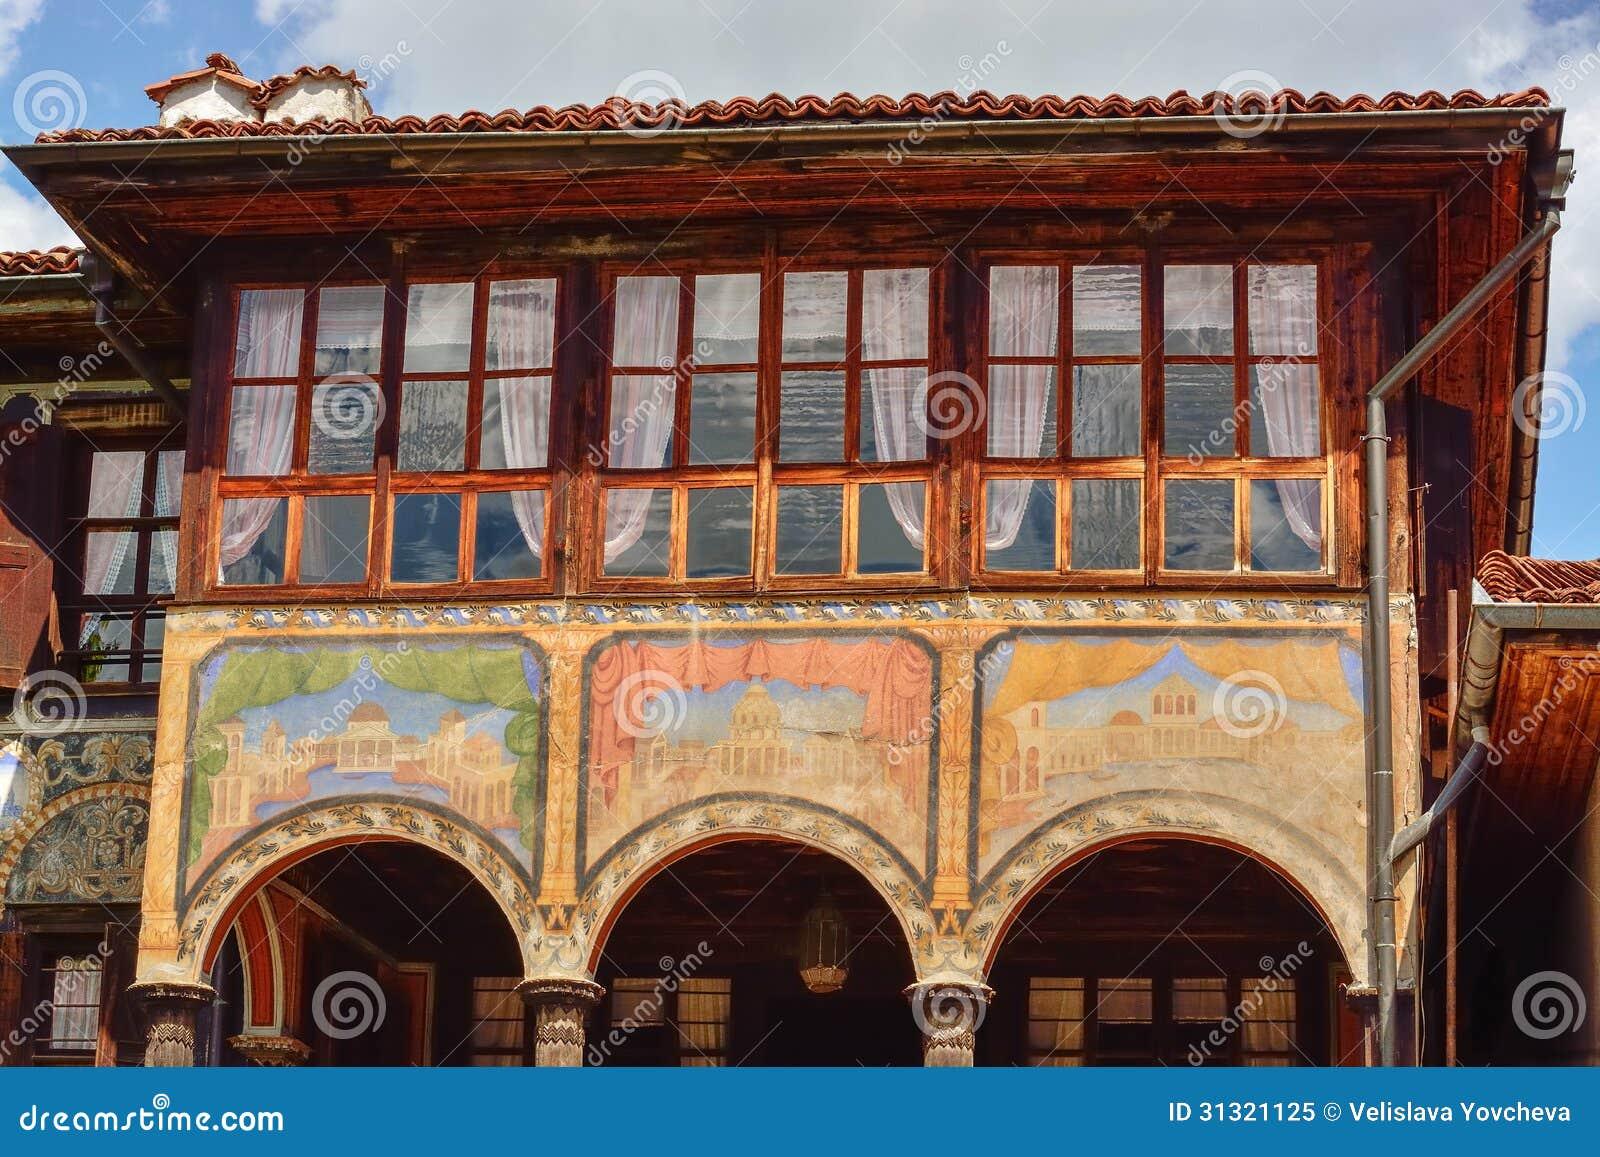 A traditional old house, Koprivshtitsa, Bulgaria